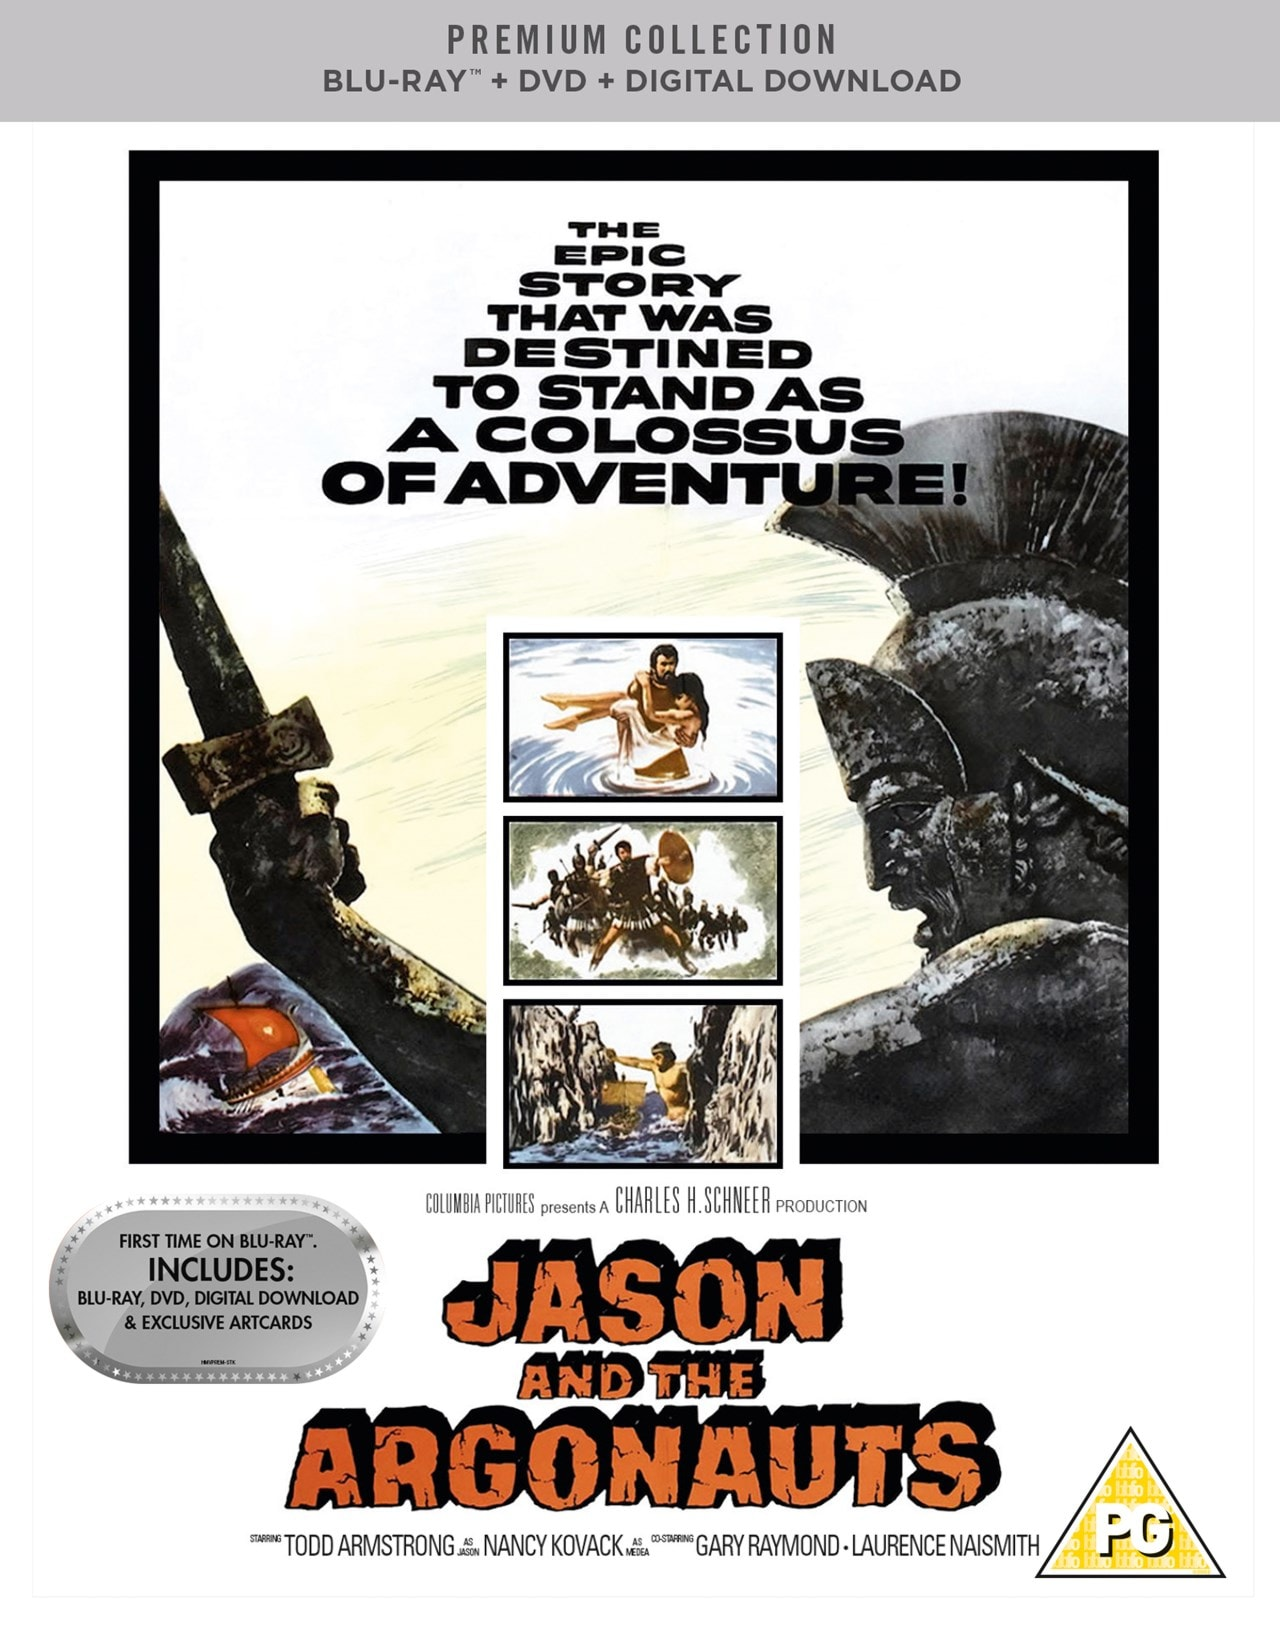 Jason and the Argonauts: (hmv Exclusive) - The Premium Collection - 1